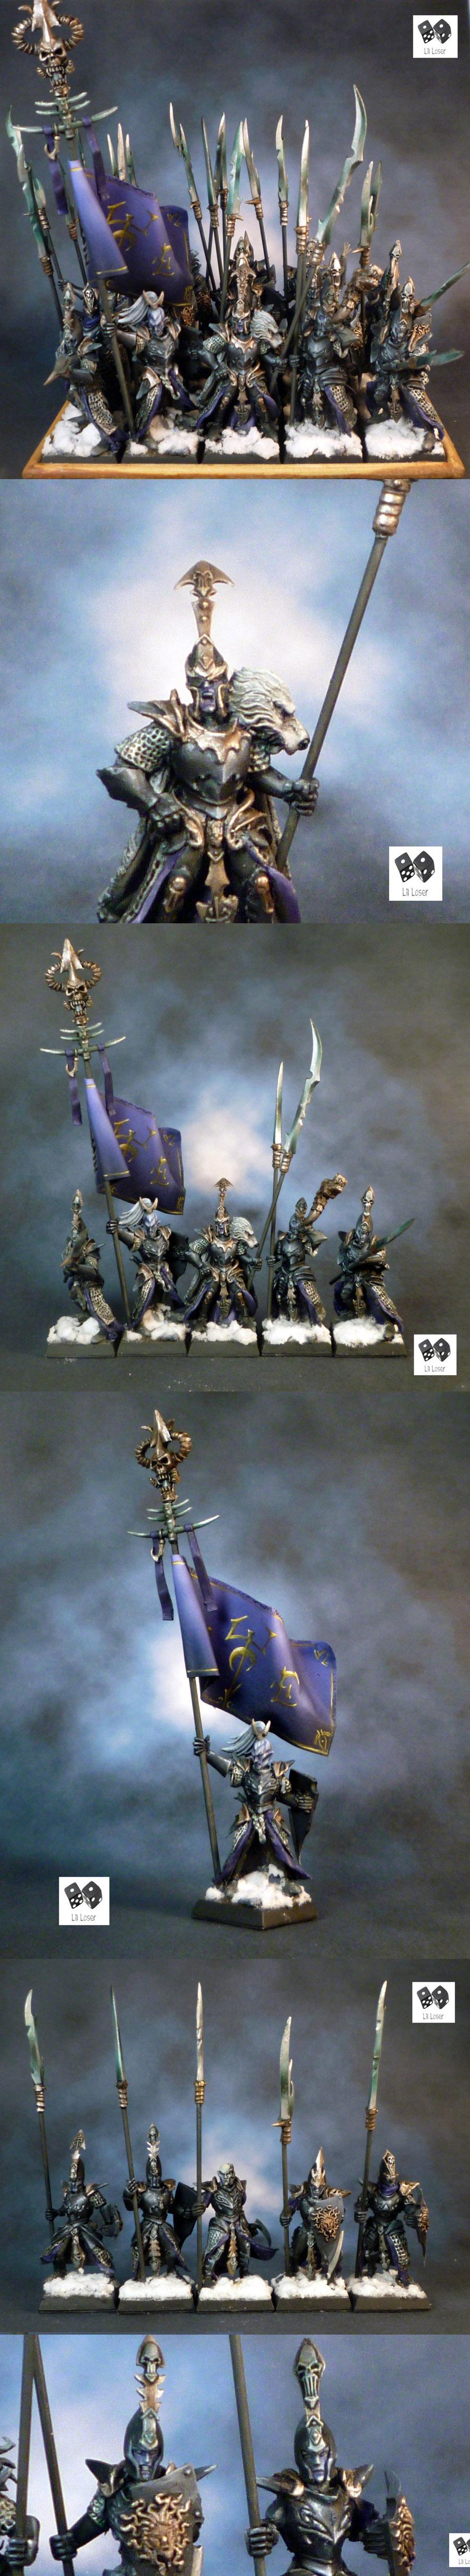 Conversion, Dark Elves, Druchii, Naggarond, Naggaroth, Non-Metallic Metal, Warriors